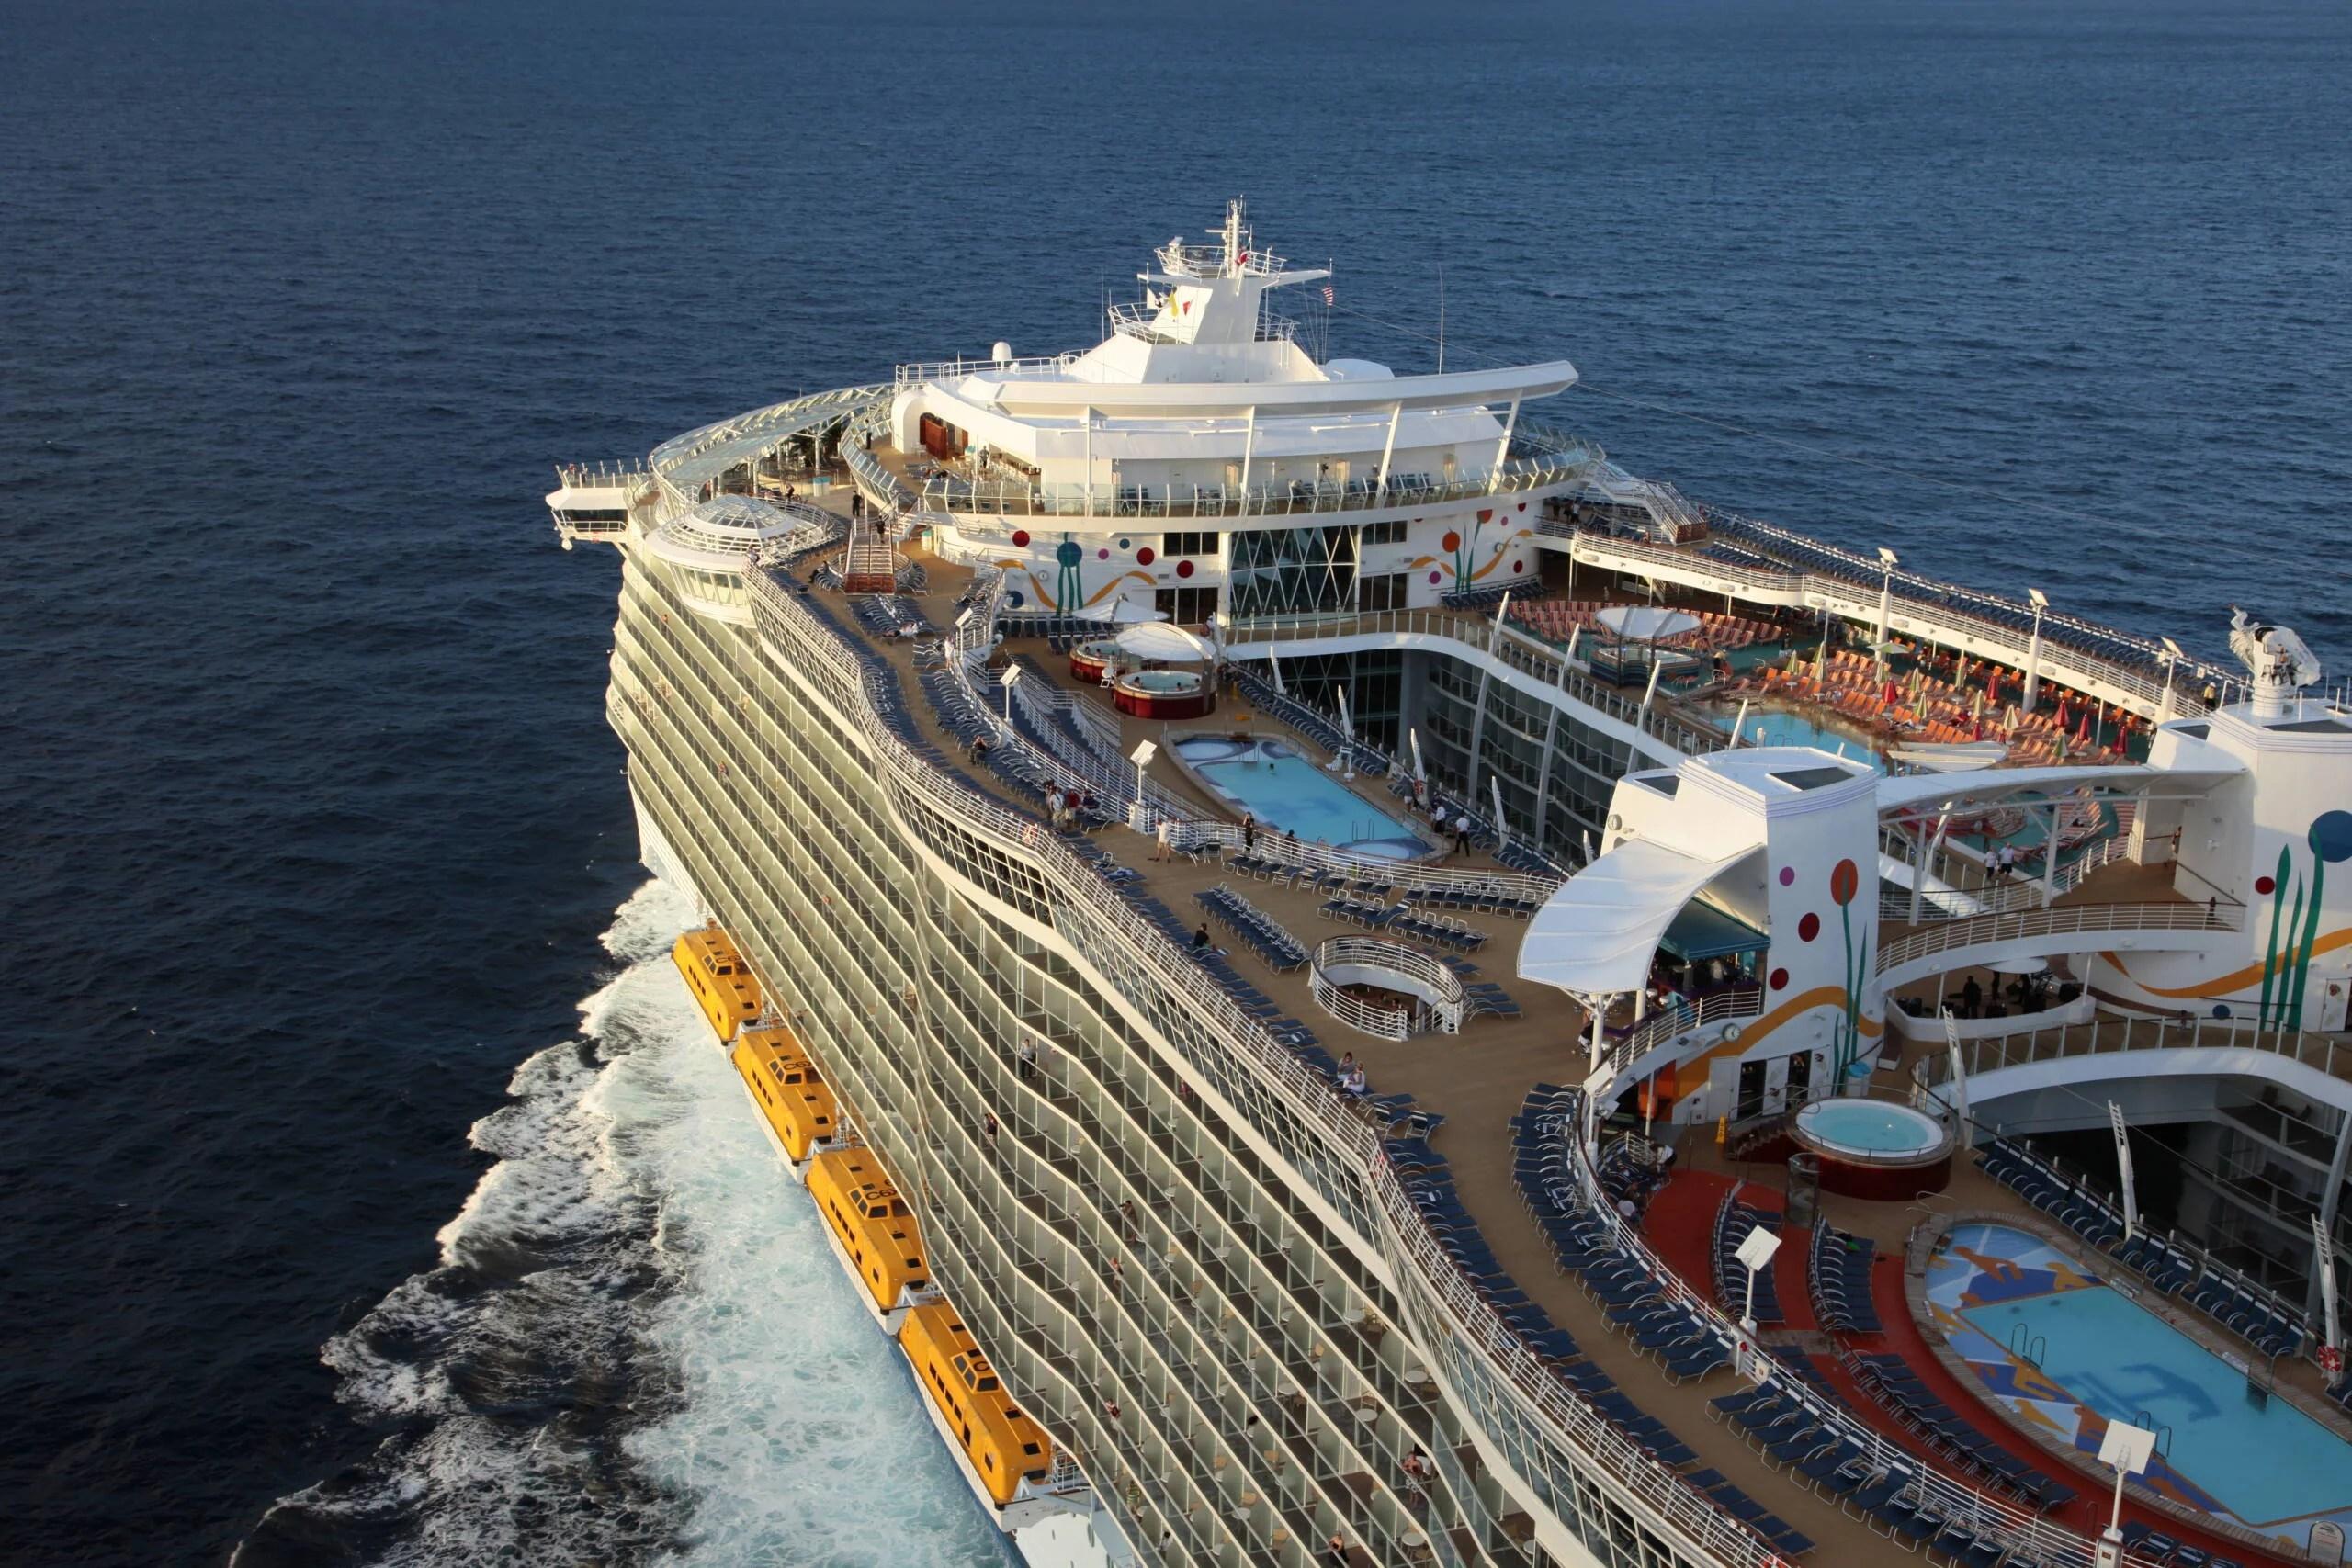 Coronavirus outbreak brings major cruise ship overhauls to a halt